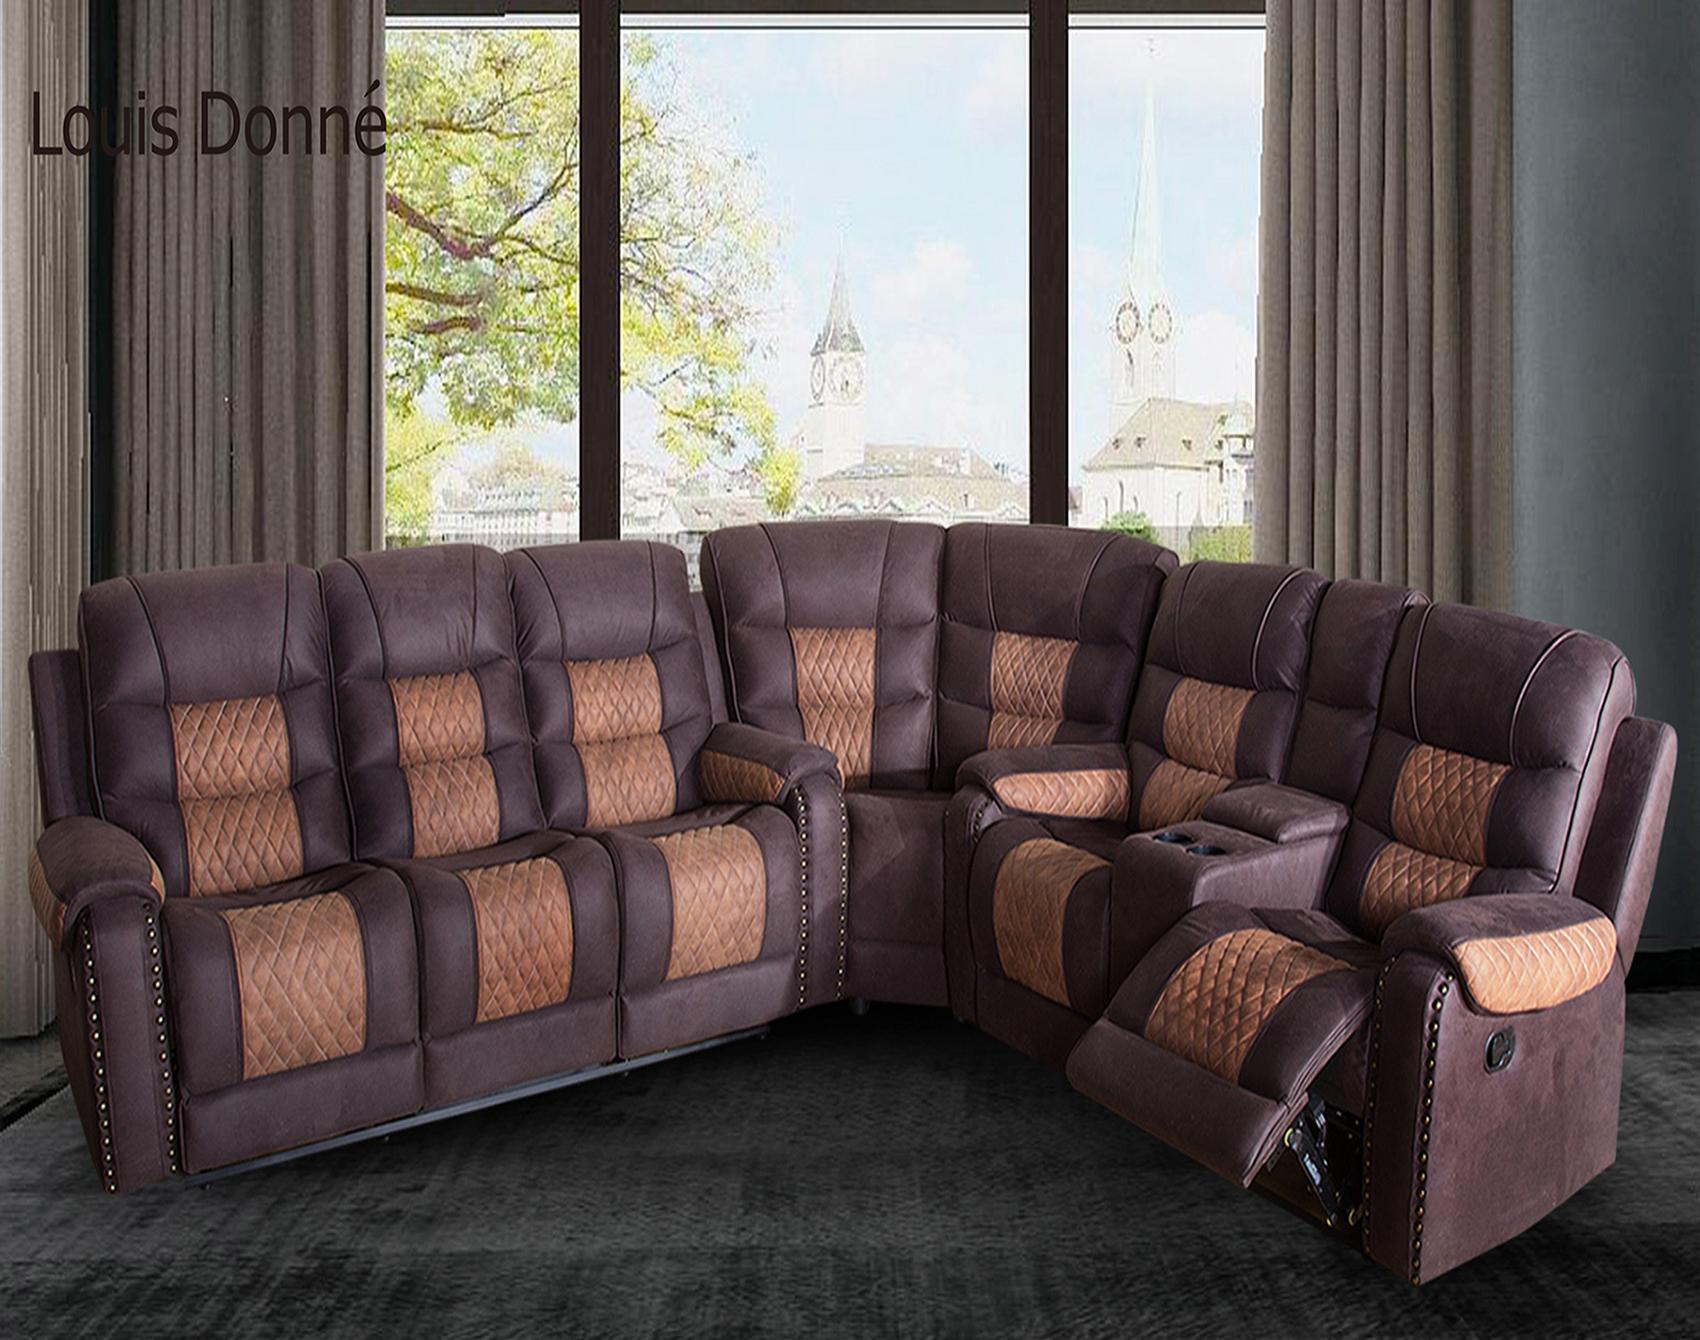 Fabrication technology of leather sofa